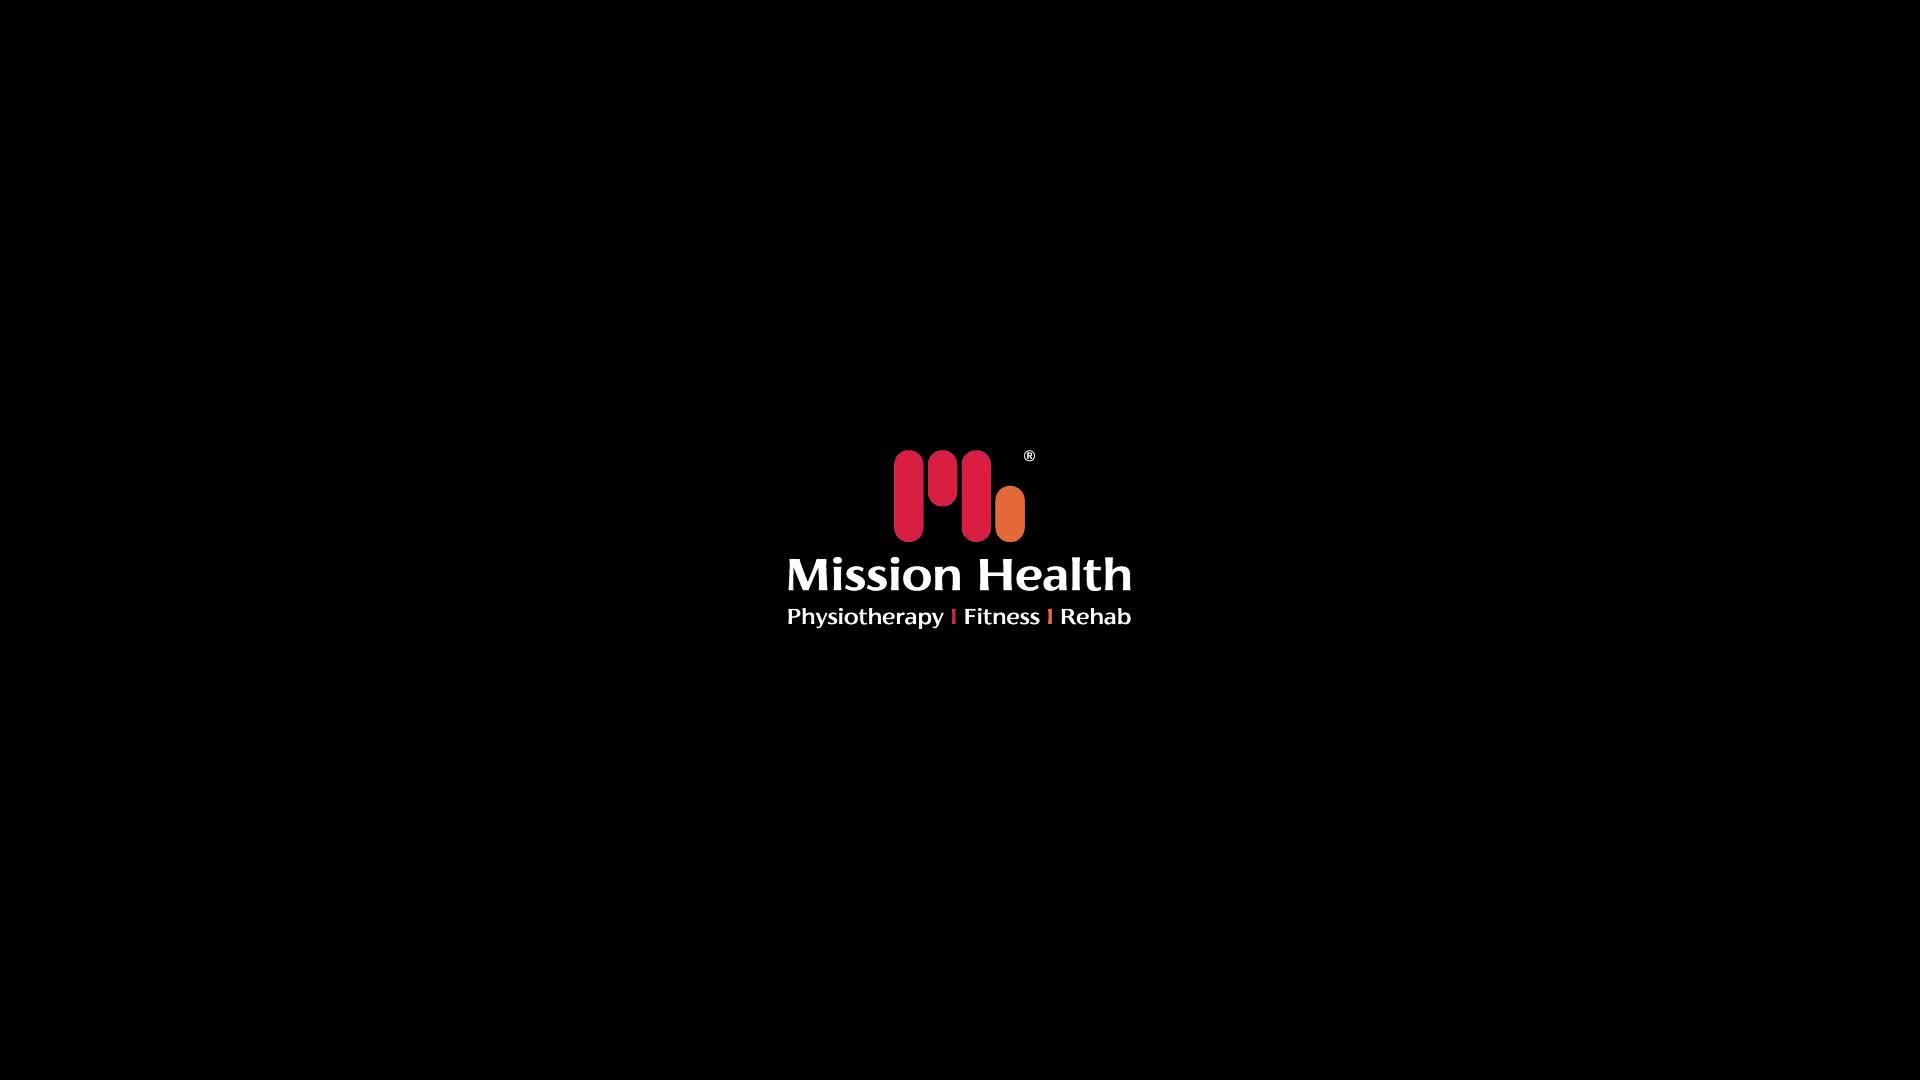 This holi, let's pledge to a healthy and clean celebration with organic colors and pure feelings.  #HappyHoli2020 #Holi2020 #HappyHoli #होली #Holi #IndianFestival  #RangBarse #Colours #FestivalOfColours #MissionHealth #MissionHealthIndia #AbilityClinic #MovementIsLife